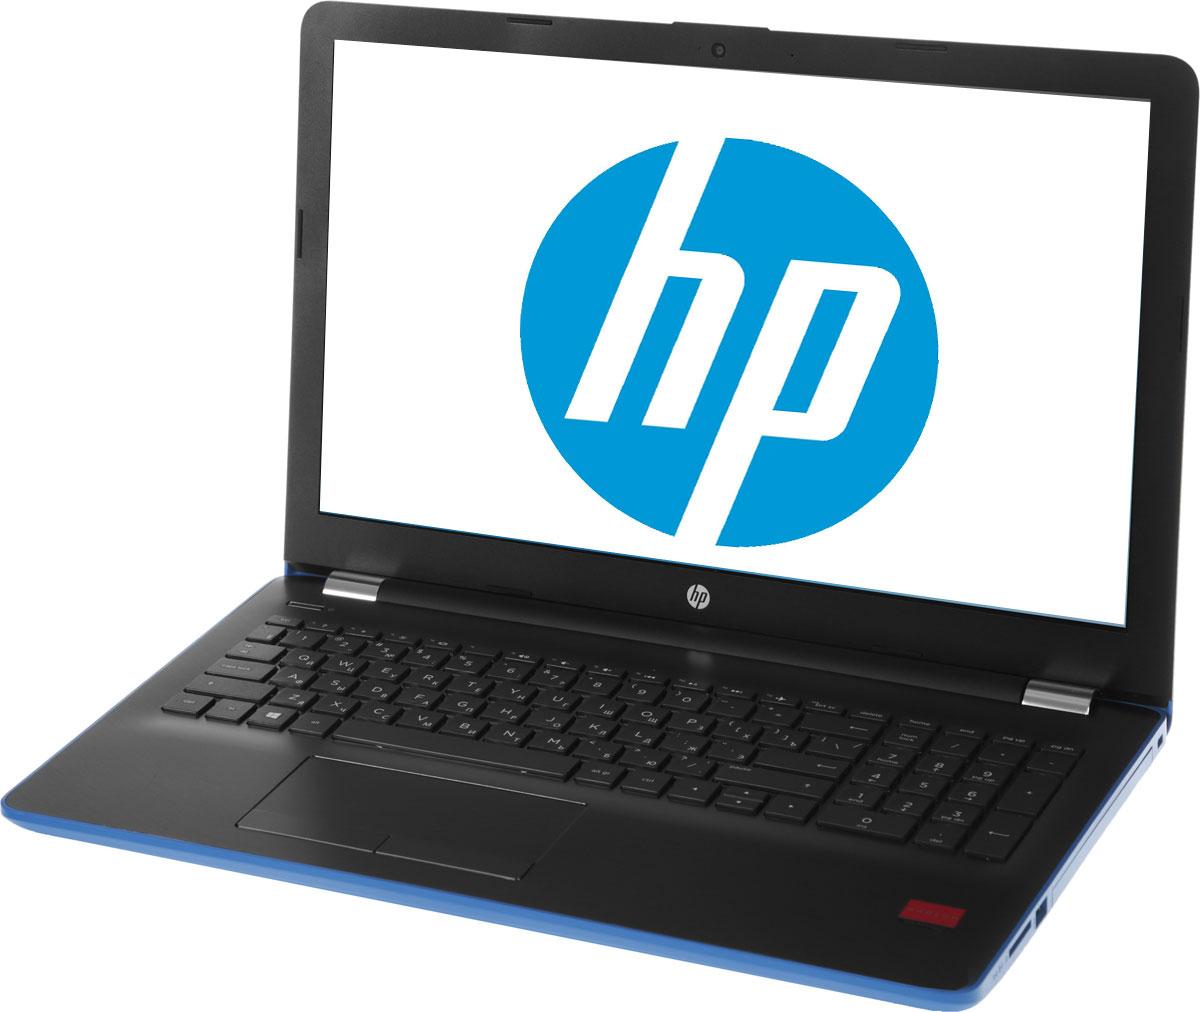 HP 15-bw531ur, Blue (2FQ68EA)